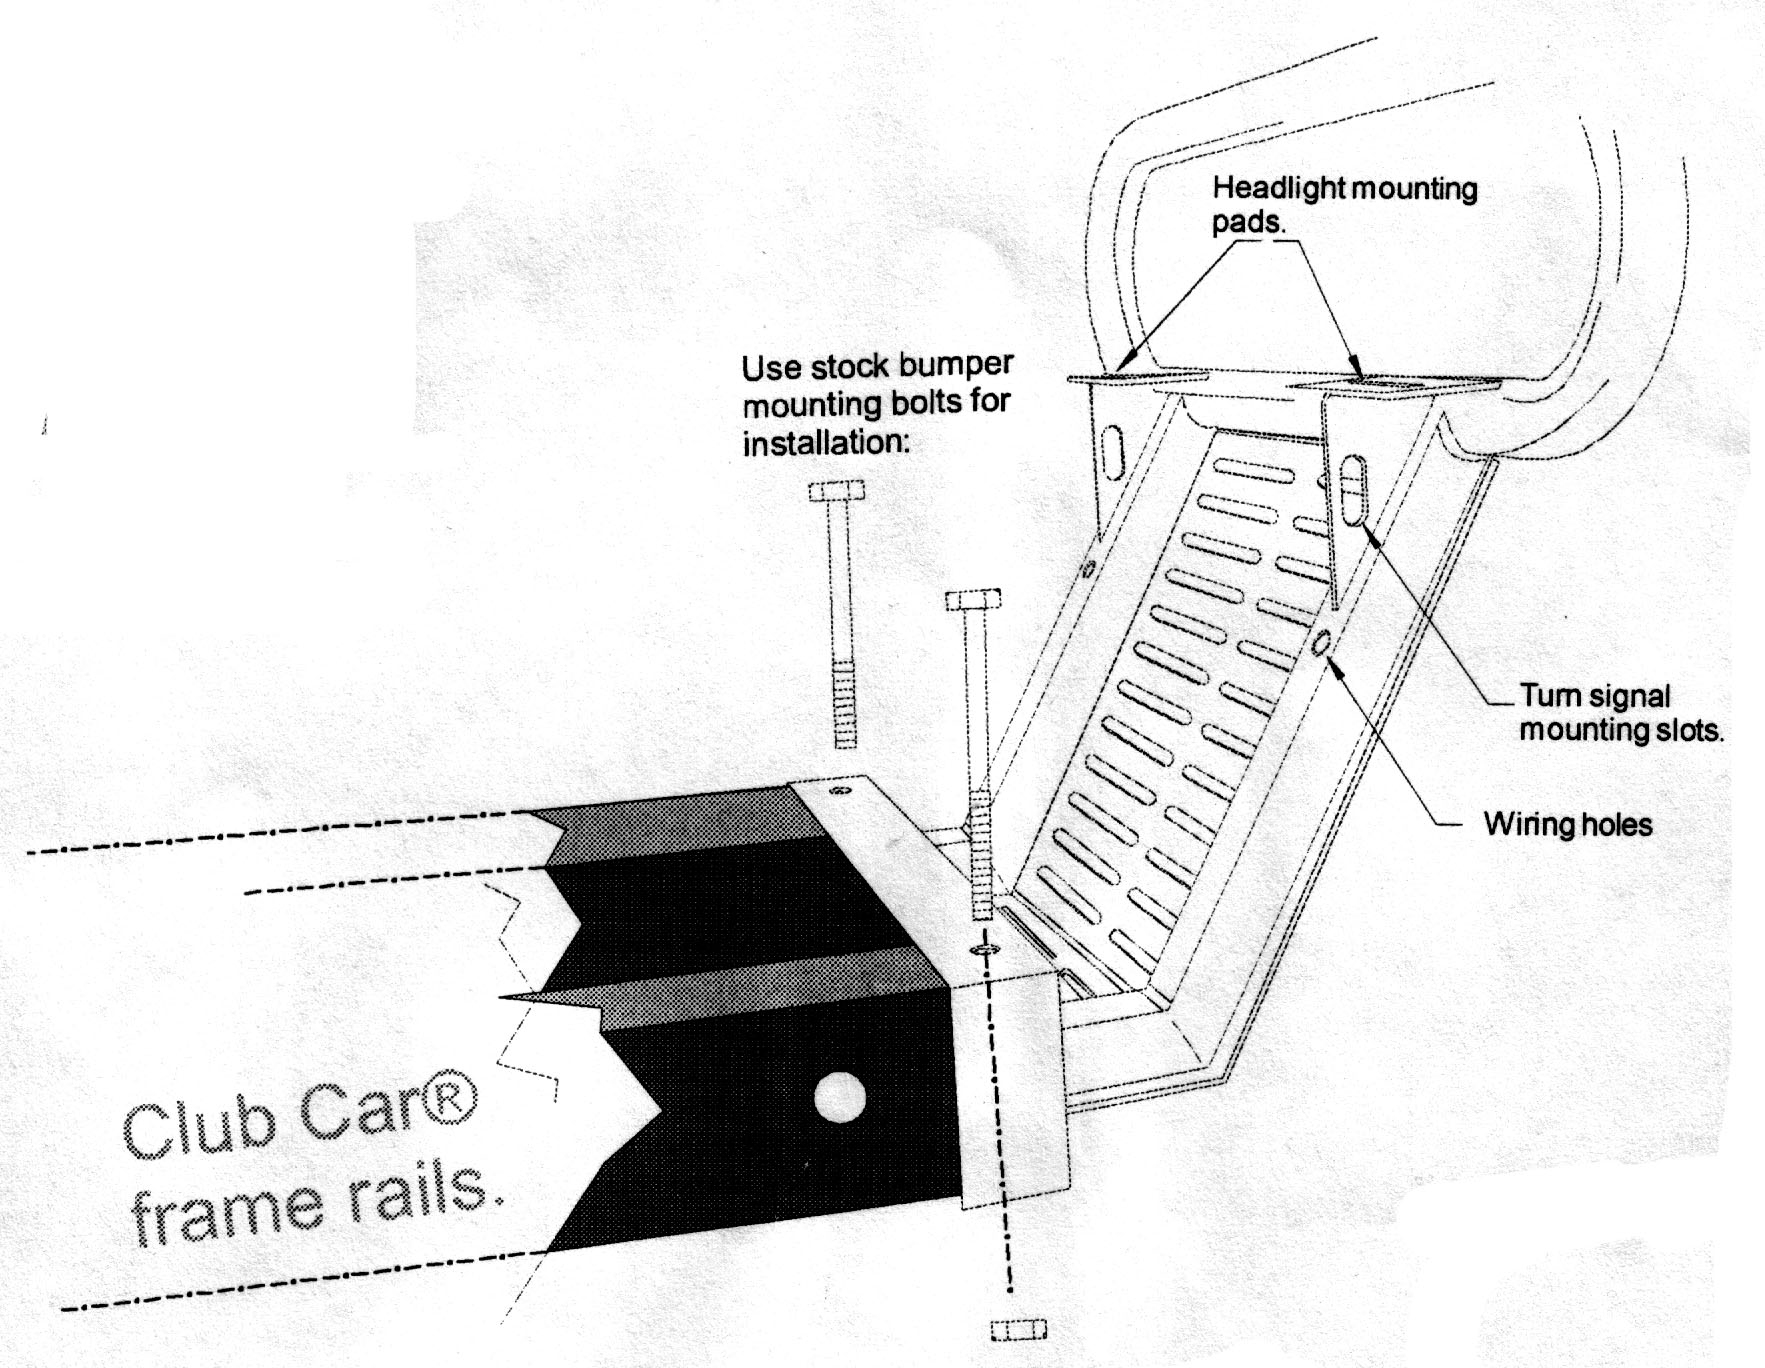 Club Car Precedent Light Kit Wiring Diagram | Wiring Library - Club Car Precedent Light Kit Wiring Diagram